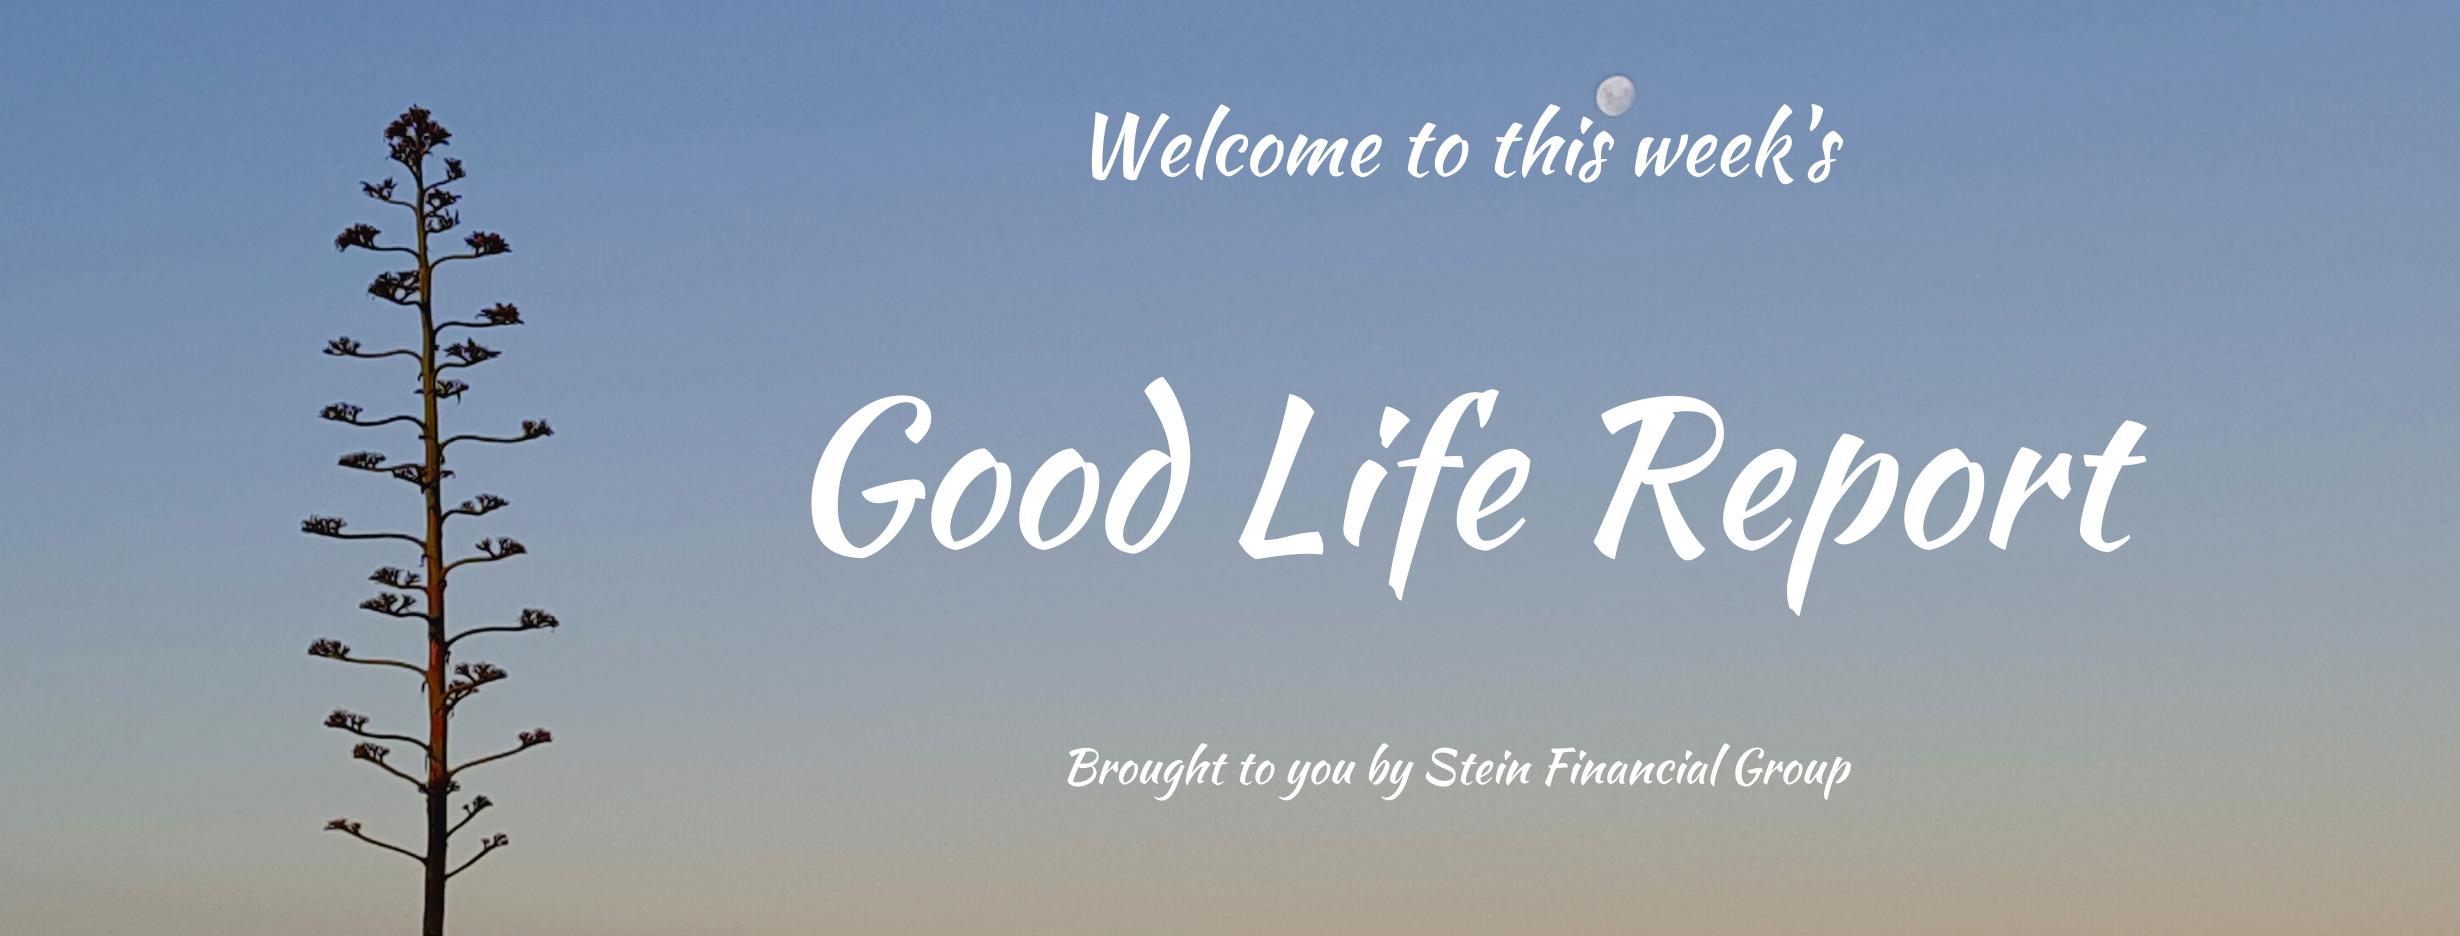 The Good Life Report 4.8.2020 Thumbnail